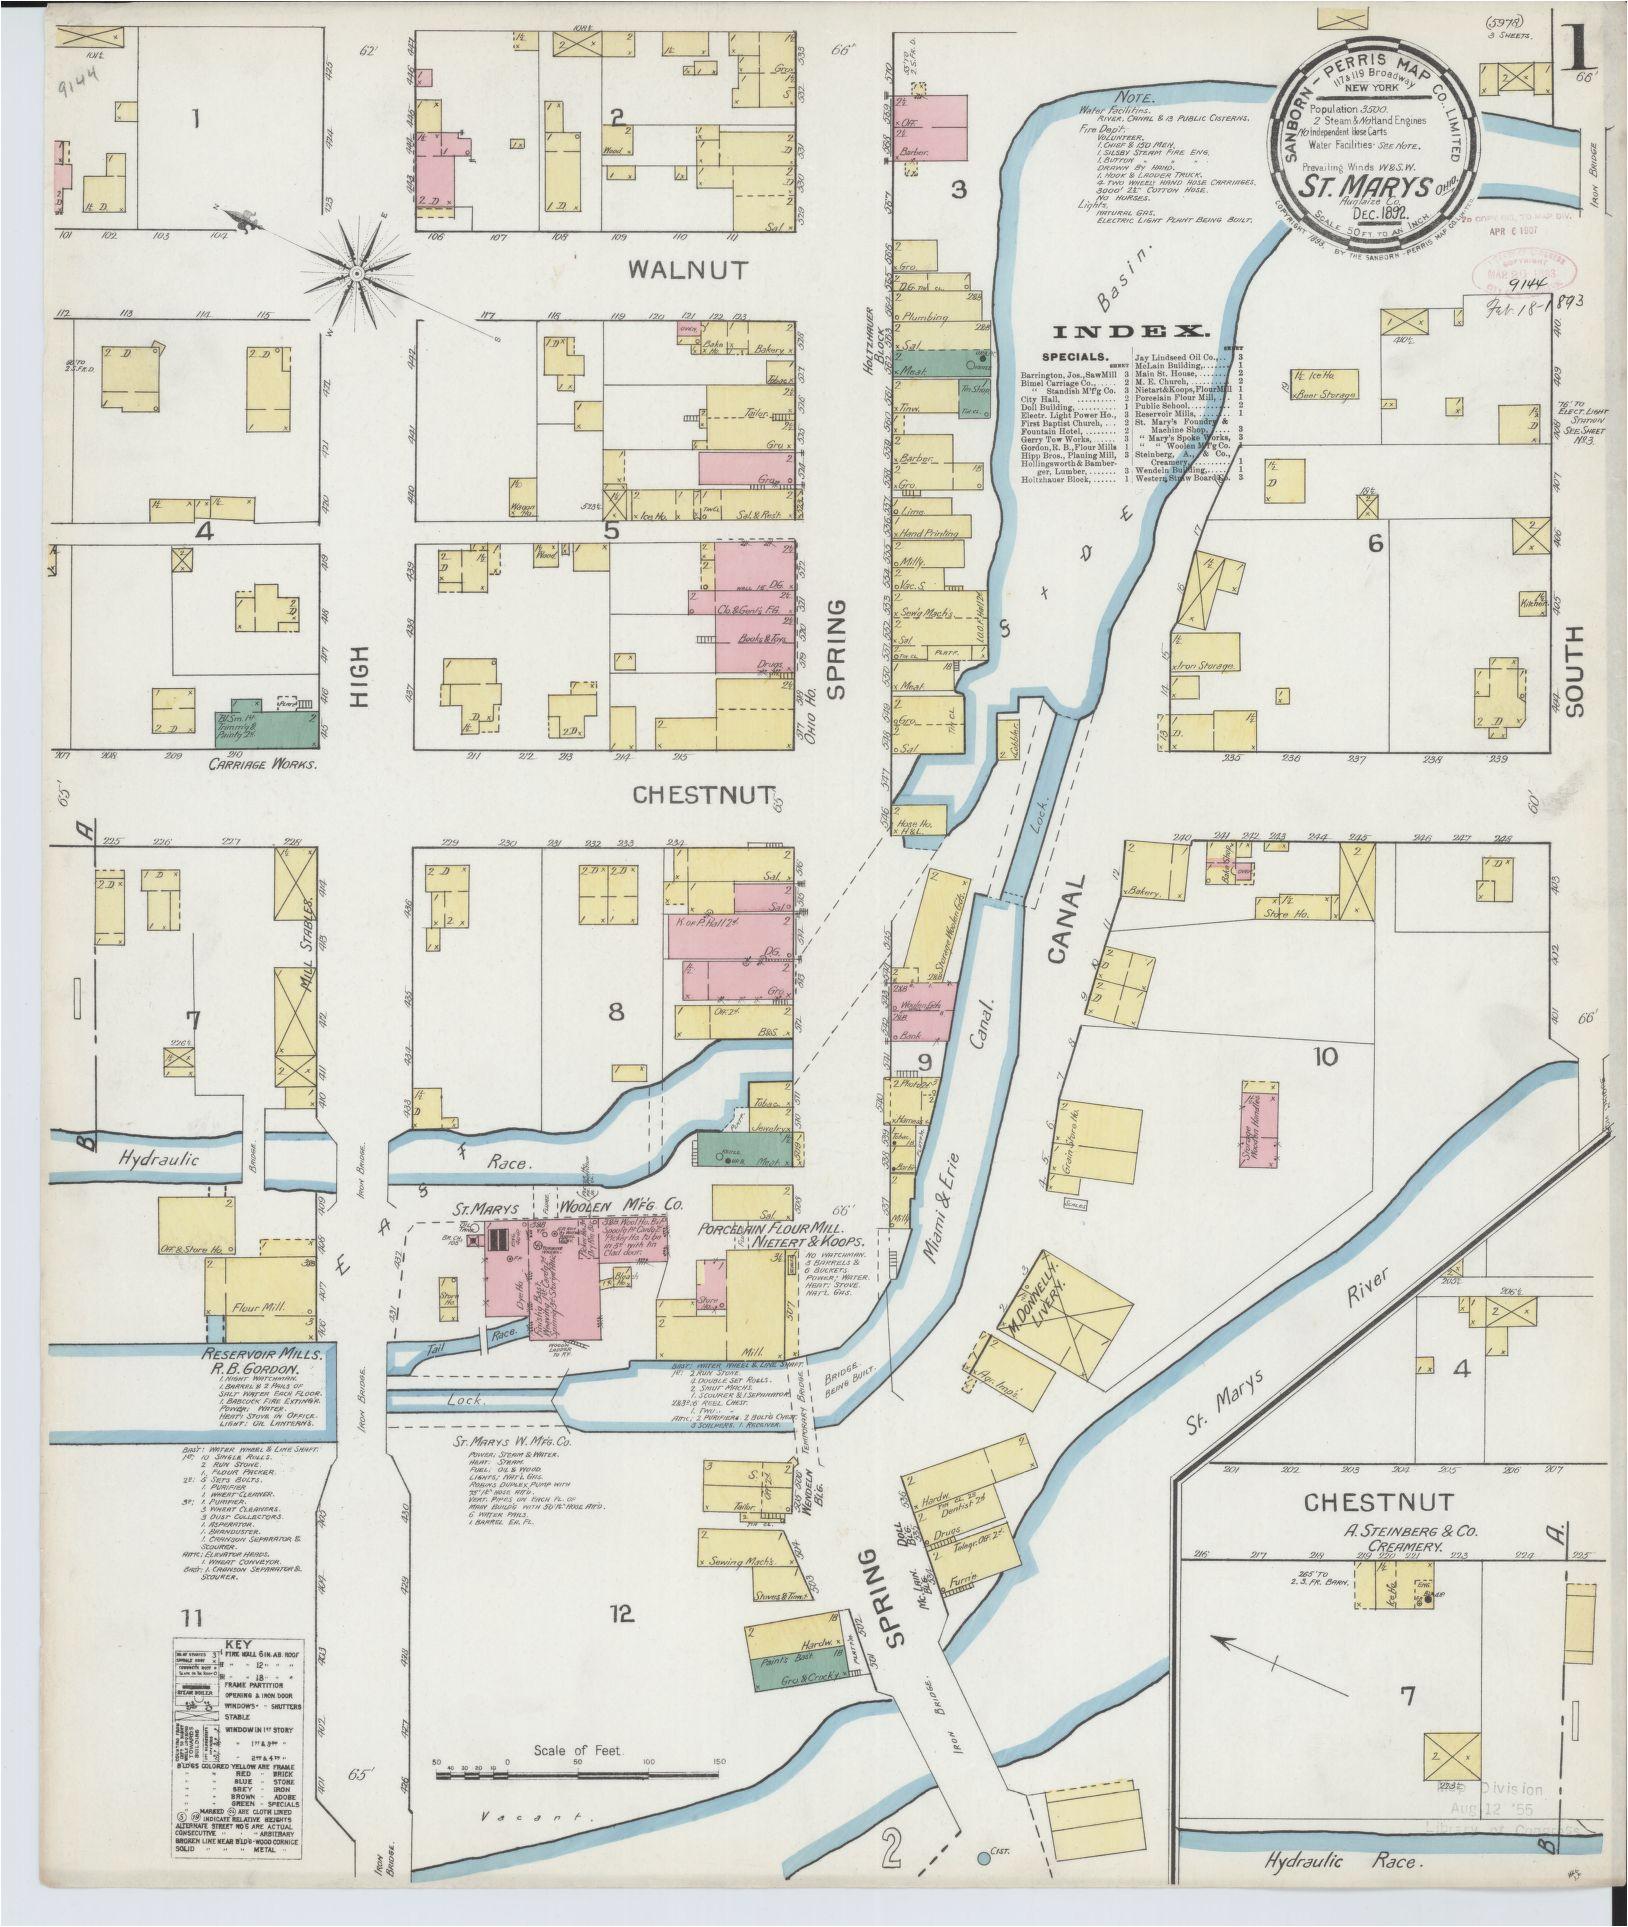 meigs county ohio property maps lovely map ohio ny county map